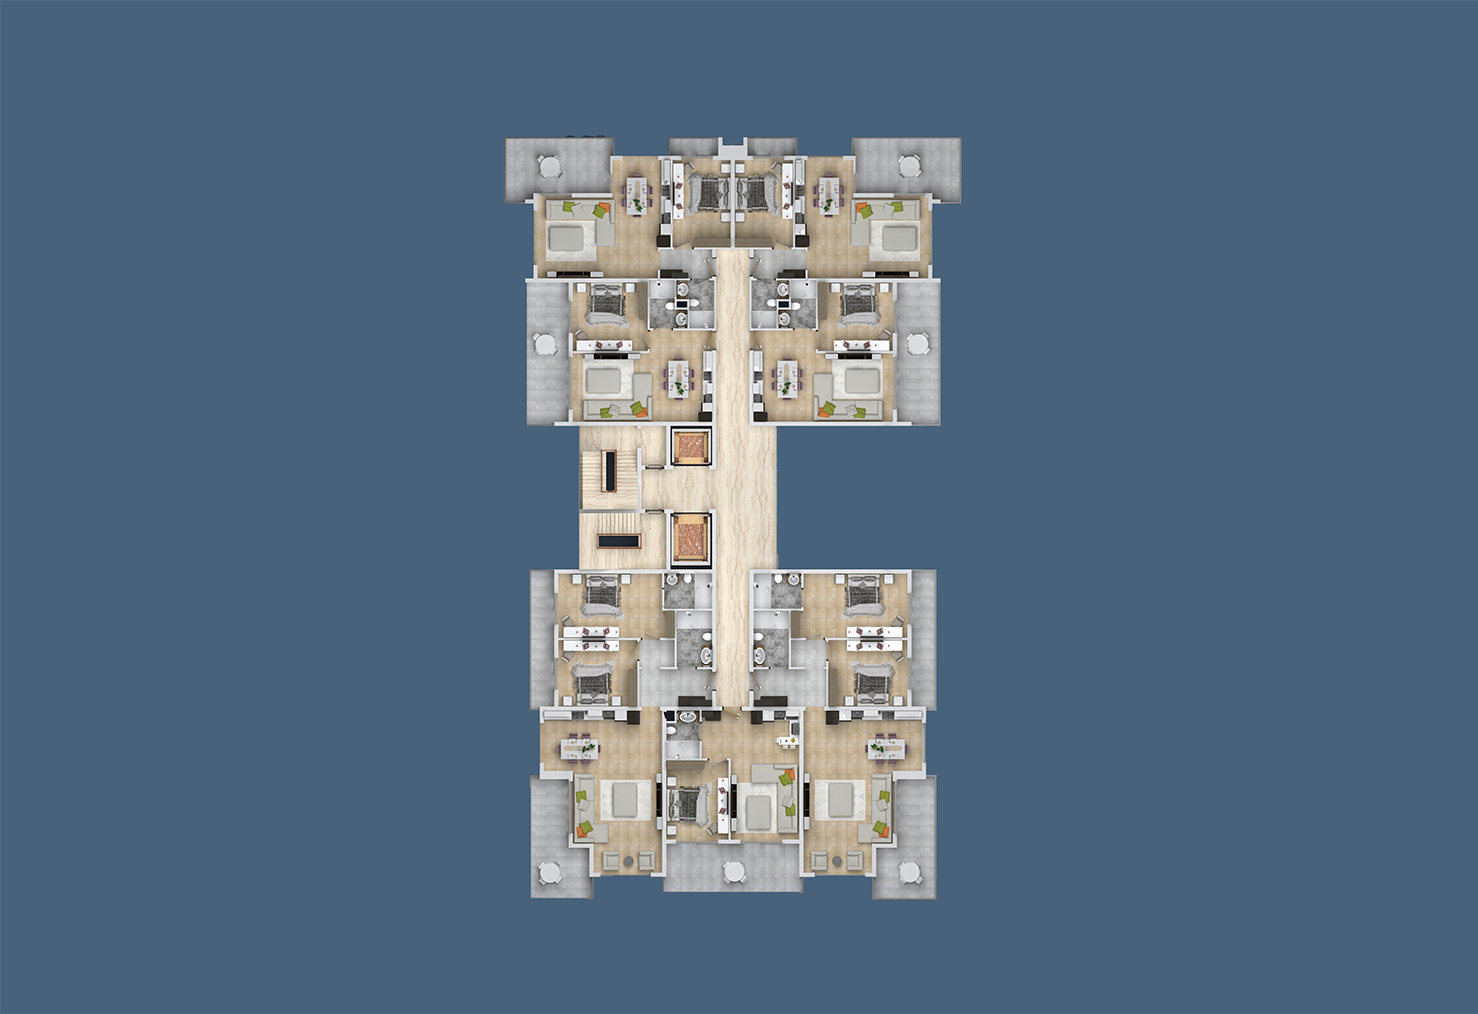 Floor plans of apartments 10 floor «B» Yekta Kingdom Trade Center